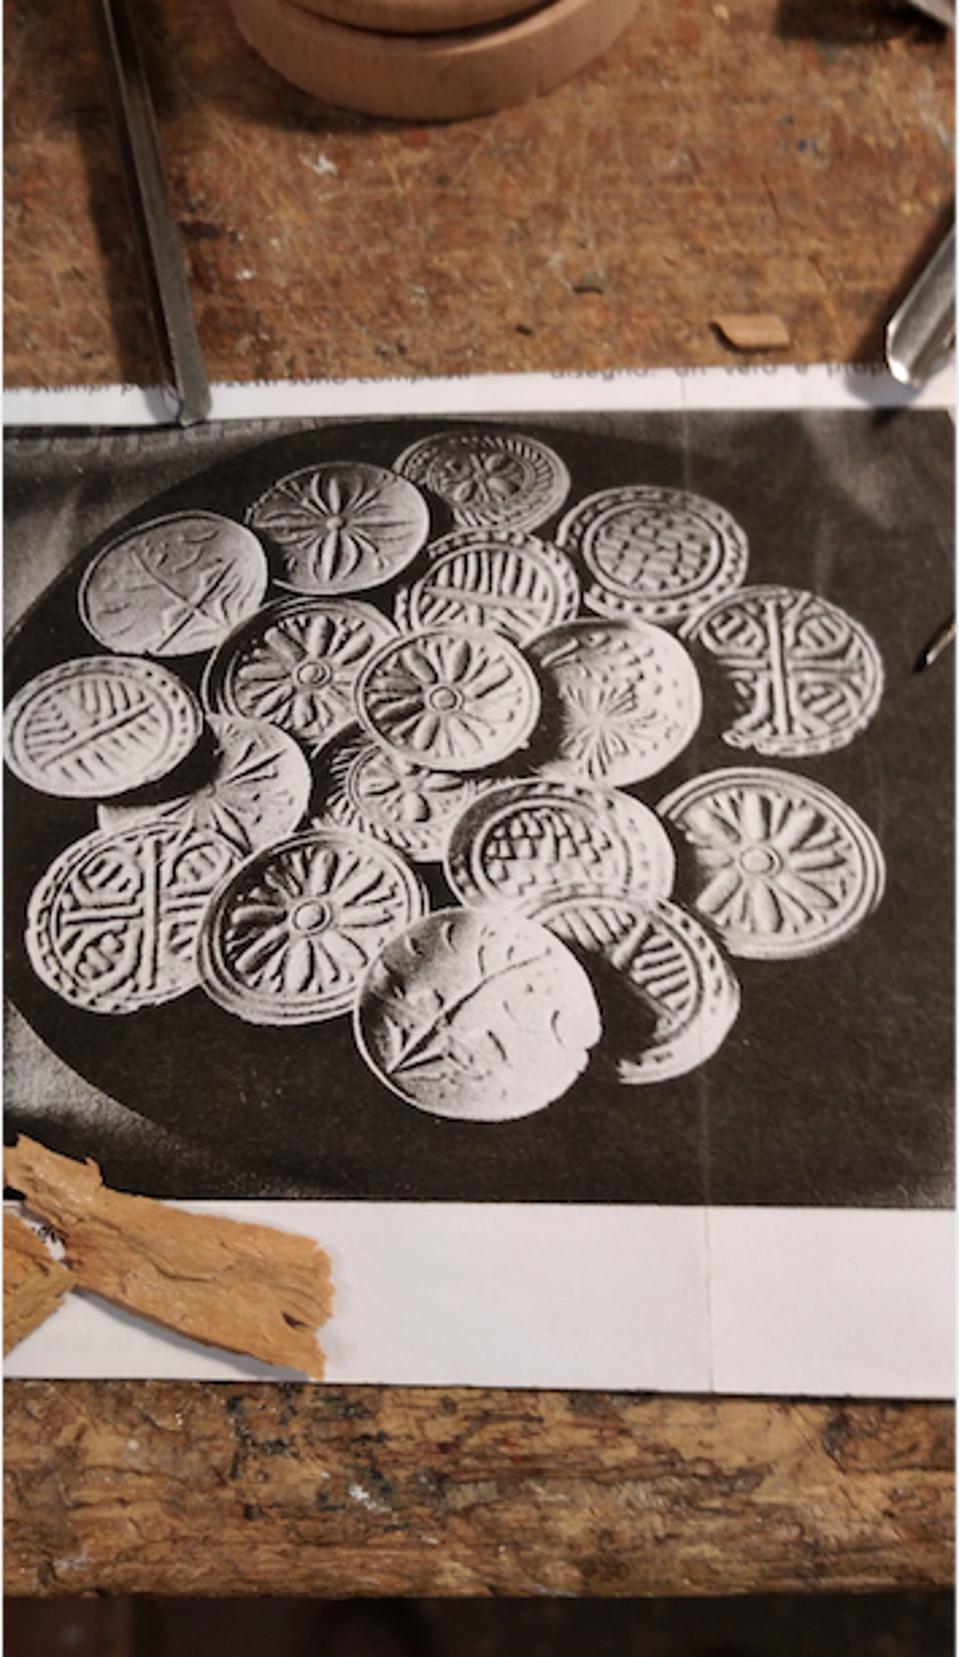 A sample of the corzetti molds by Franco Casoni.